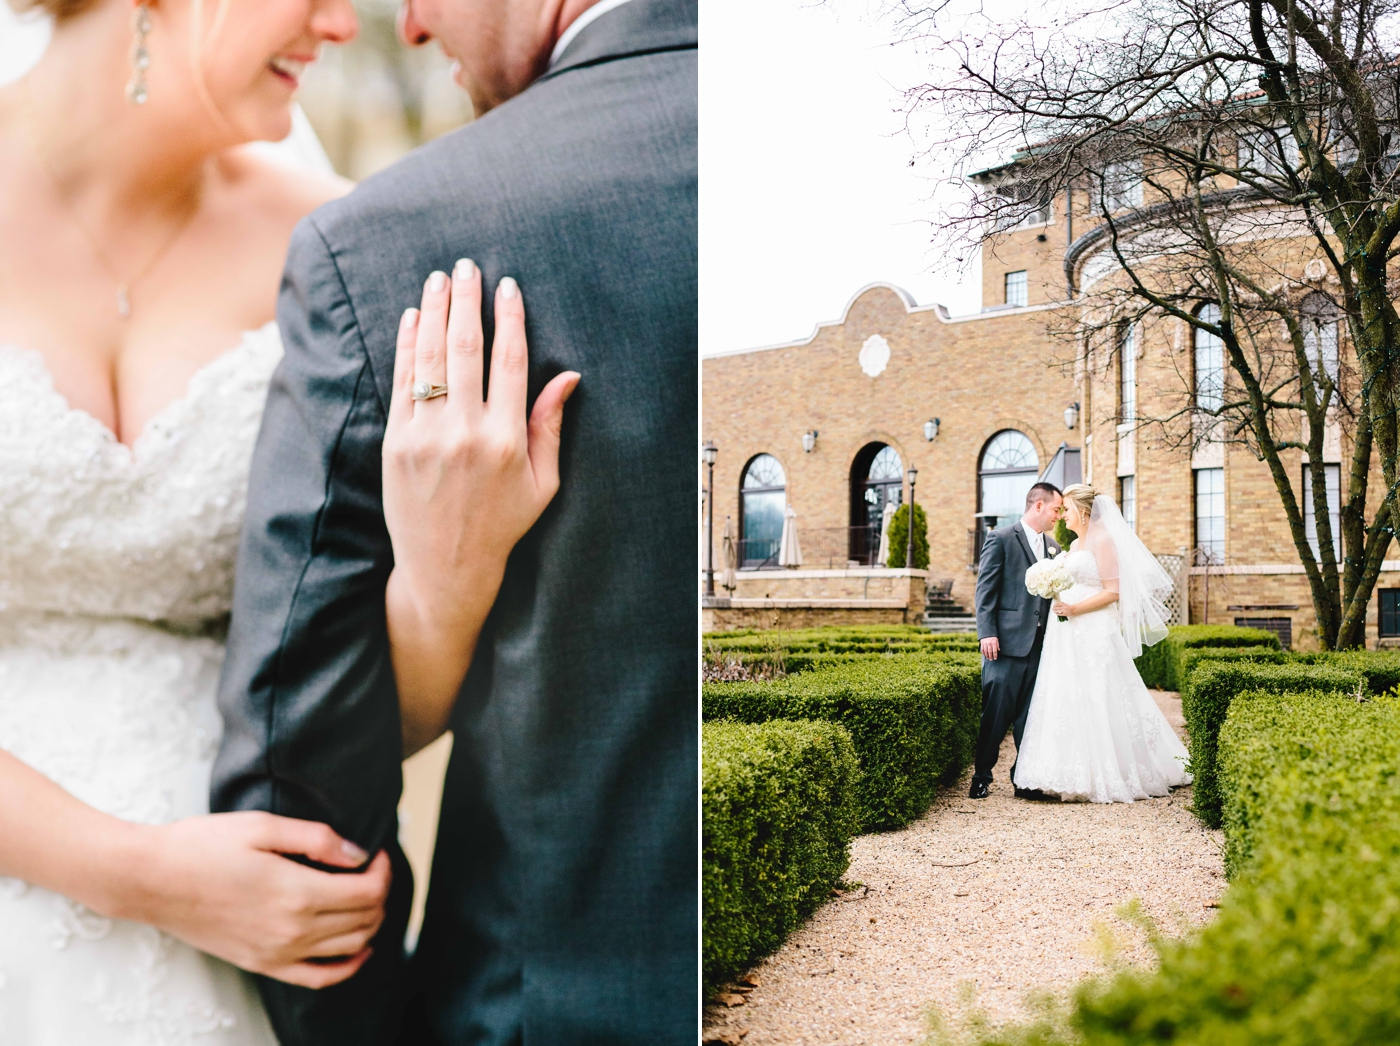 chicago-fine-art-wedding-photography-cassady15